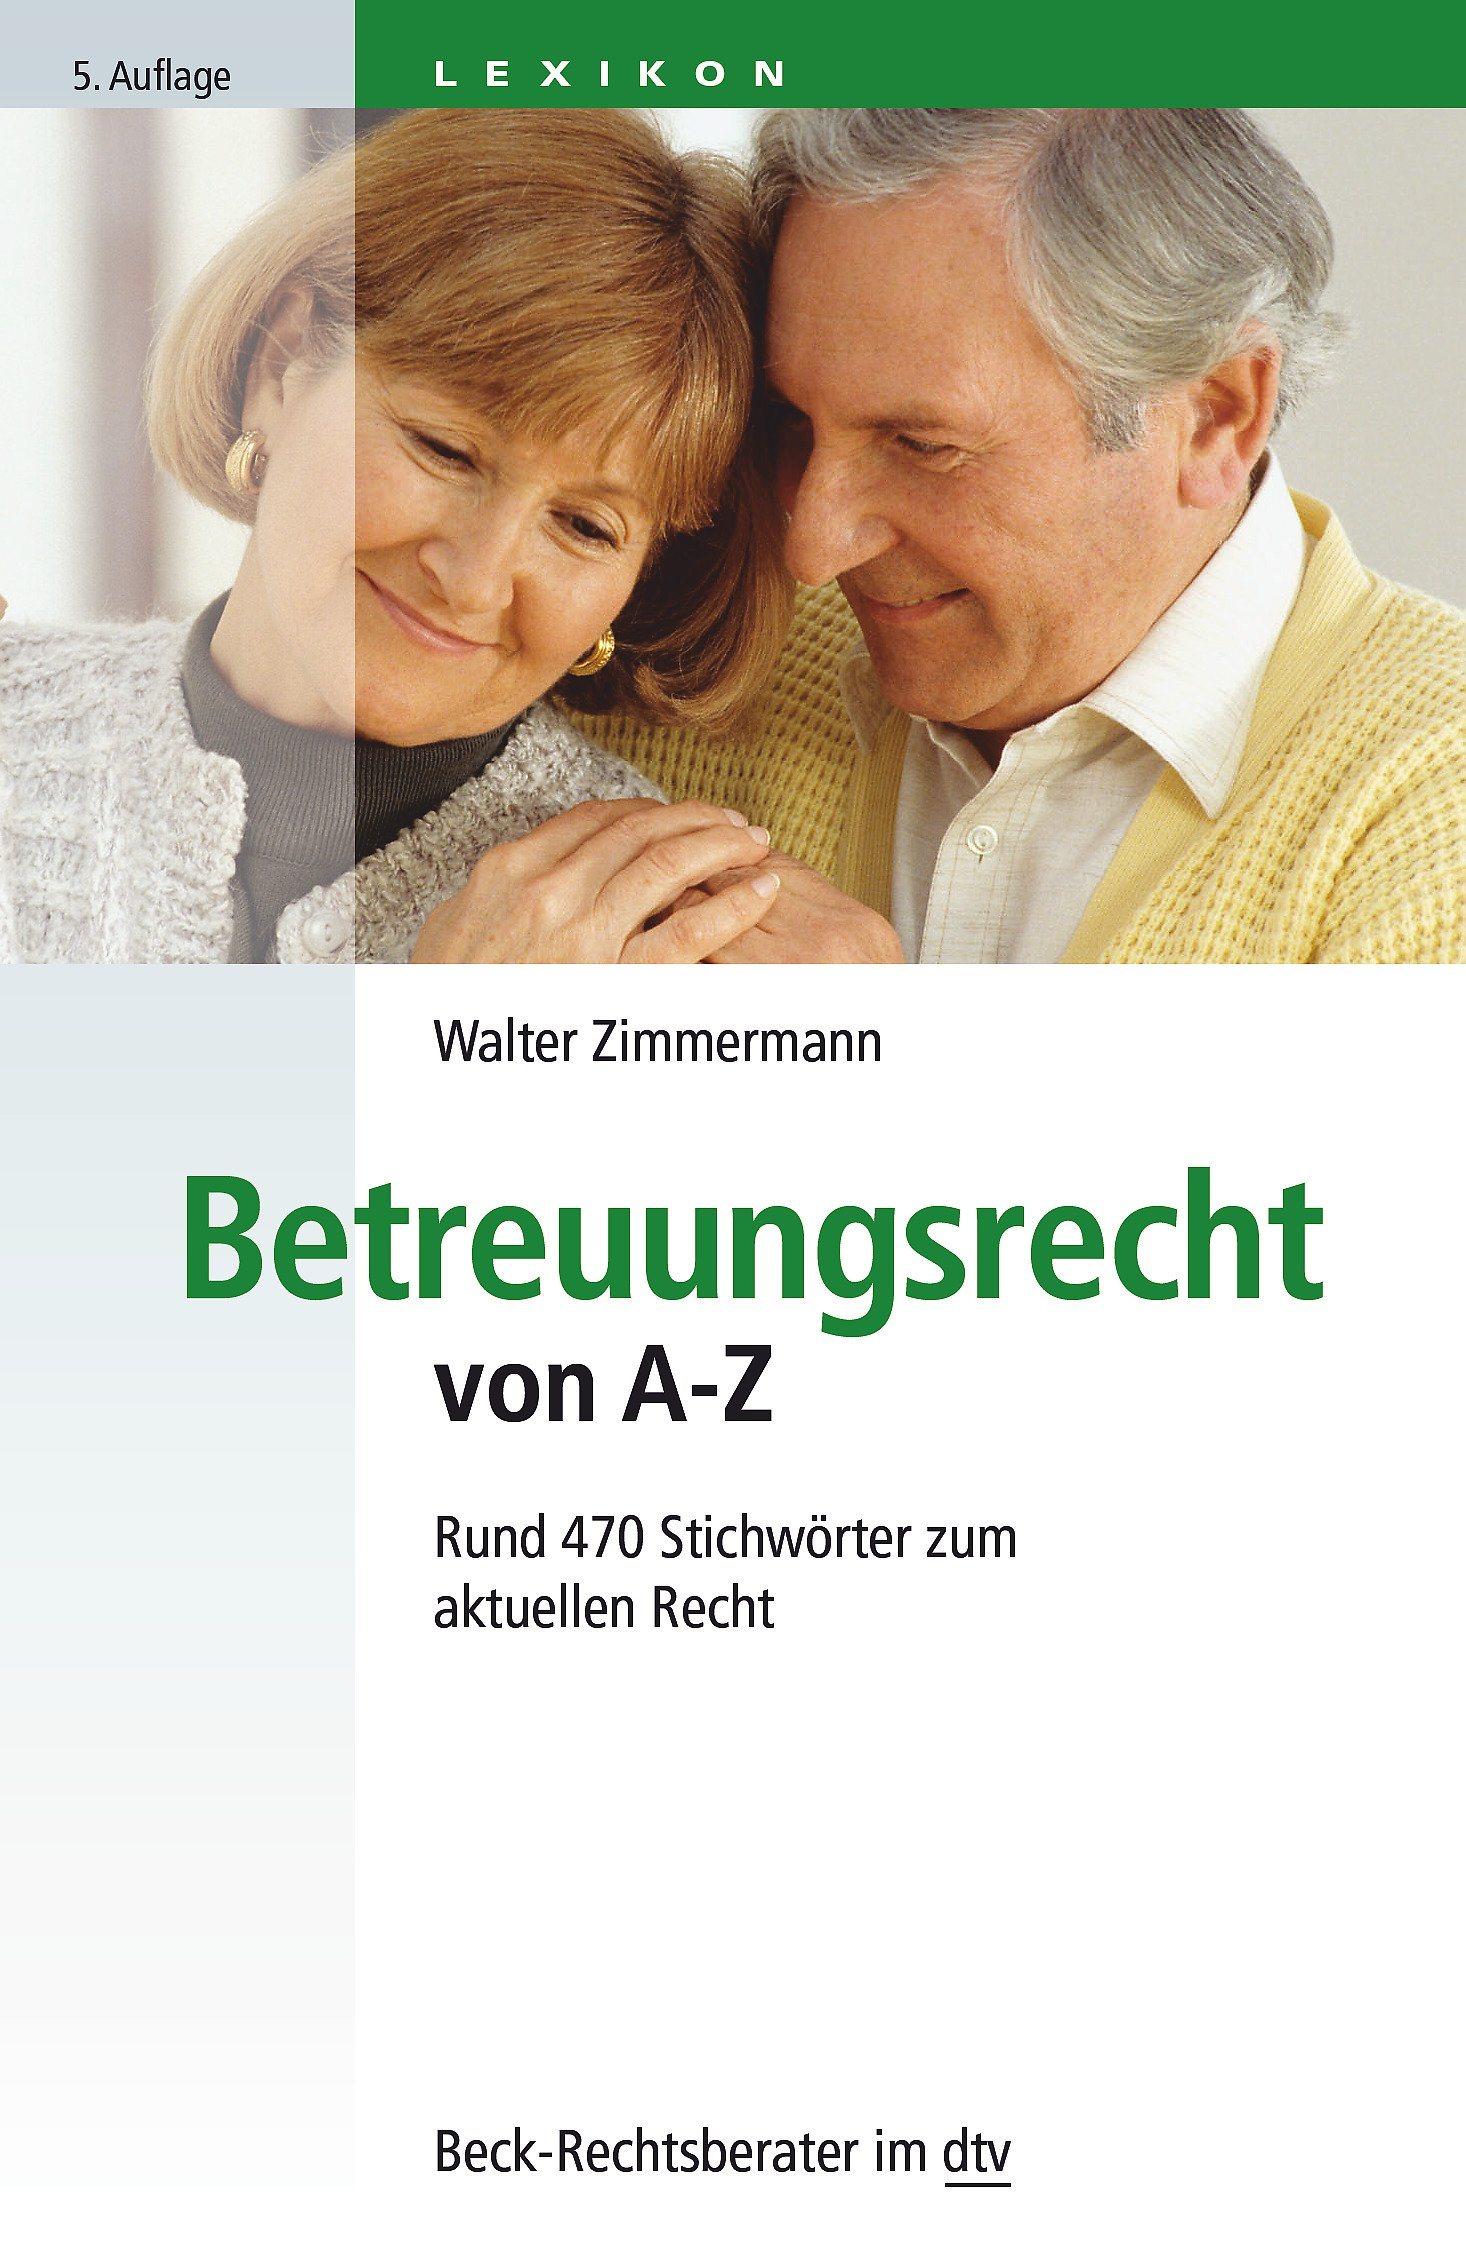 Betreuungsrecht von A - Z: Rund 470 Stichwörter zum aktuellen Recht (dtv Beck Rechtsberater)